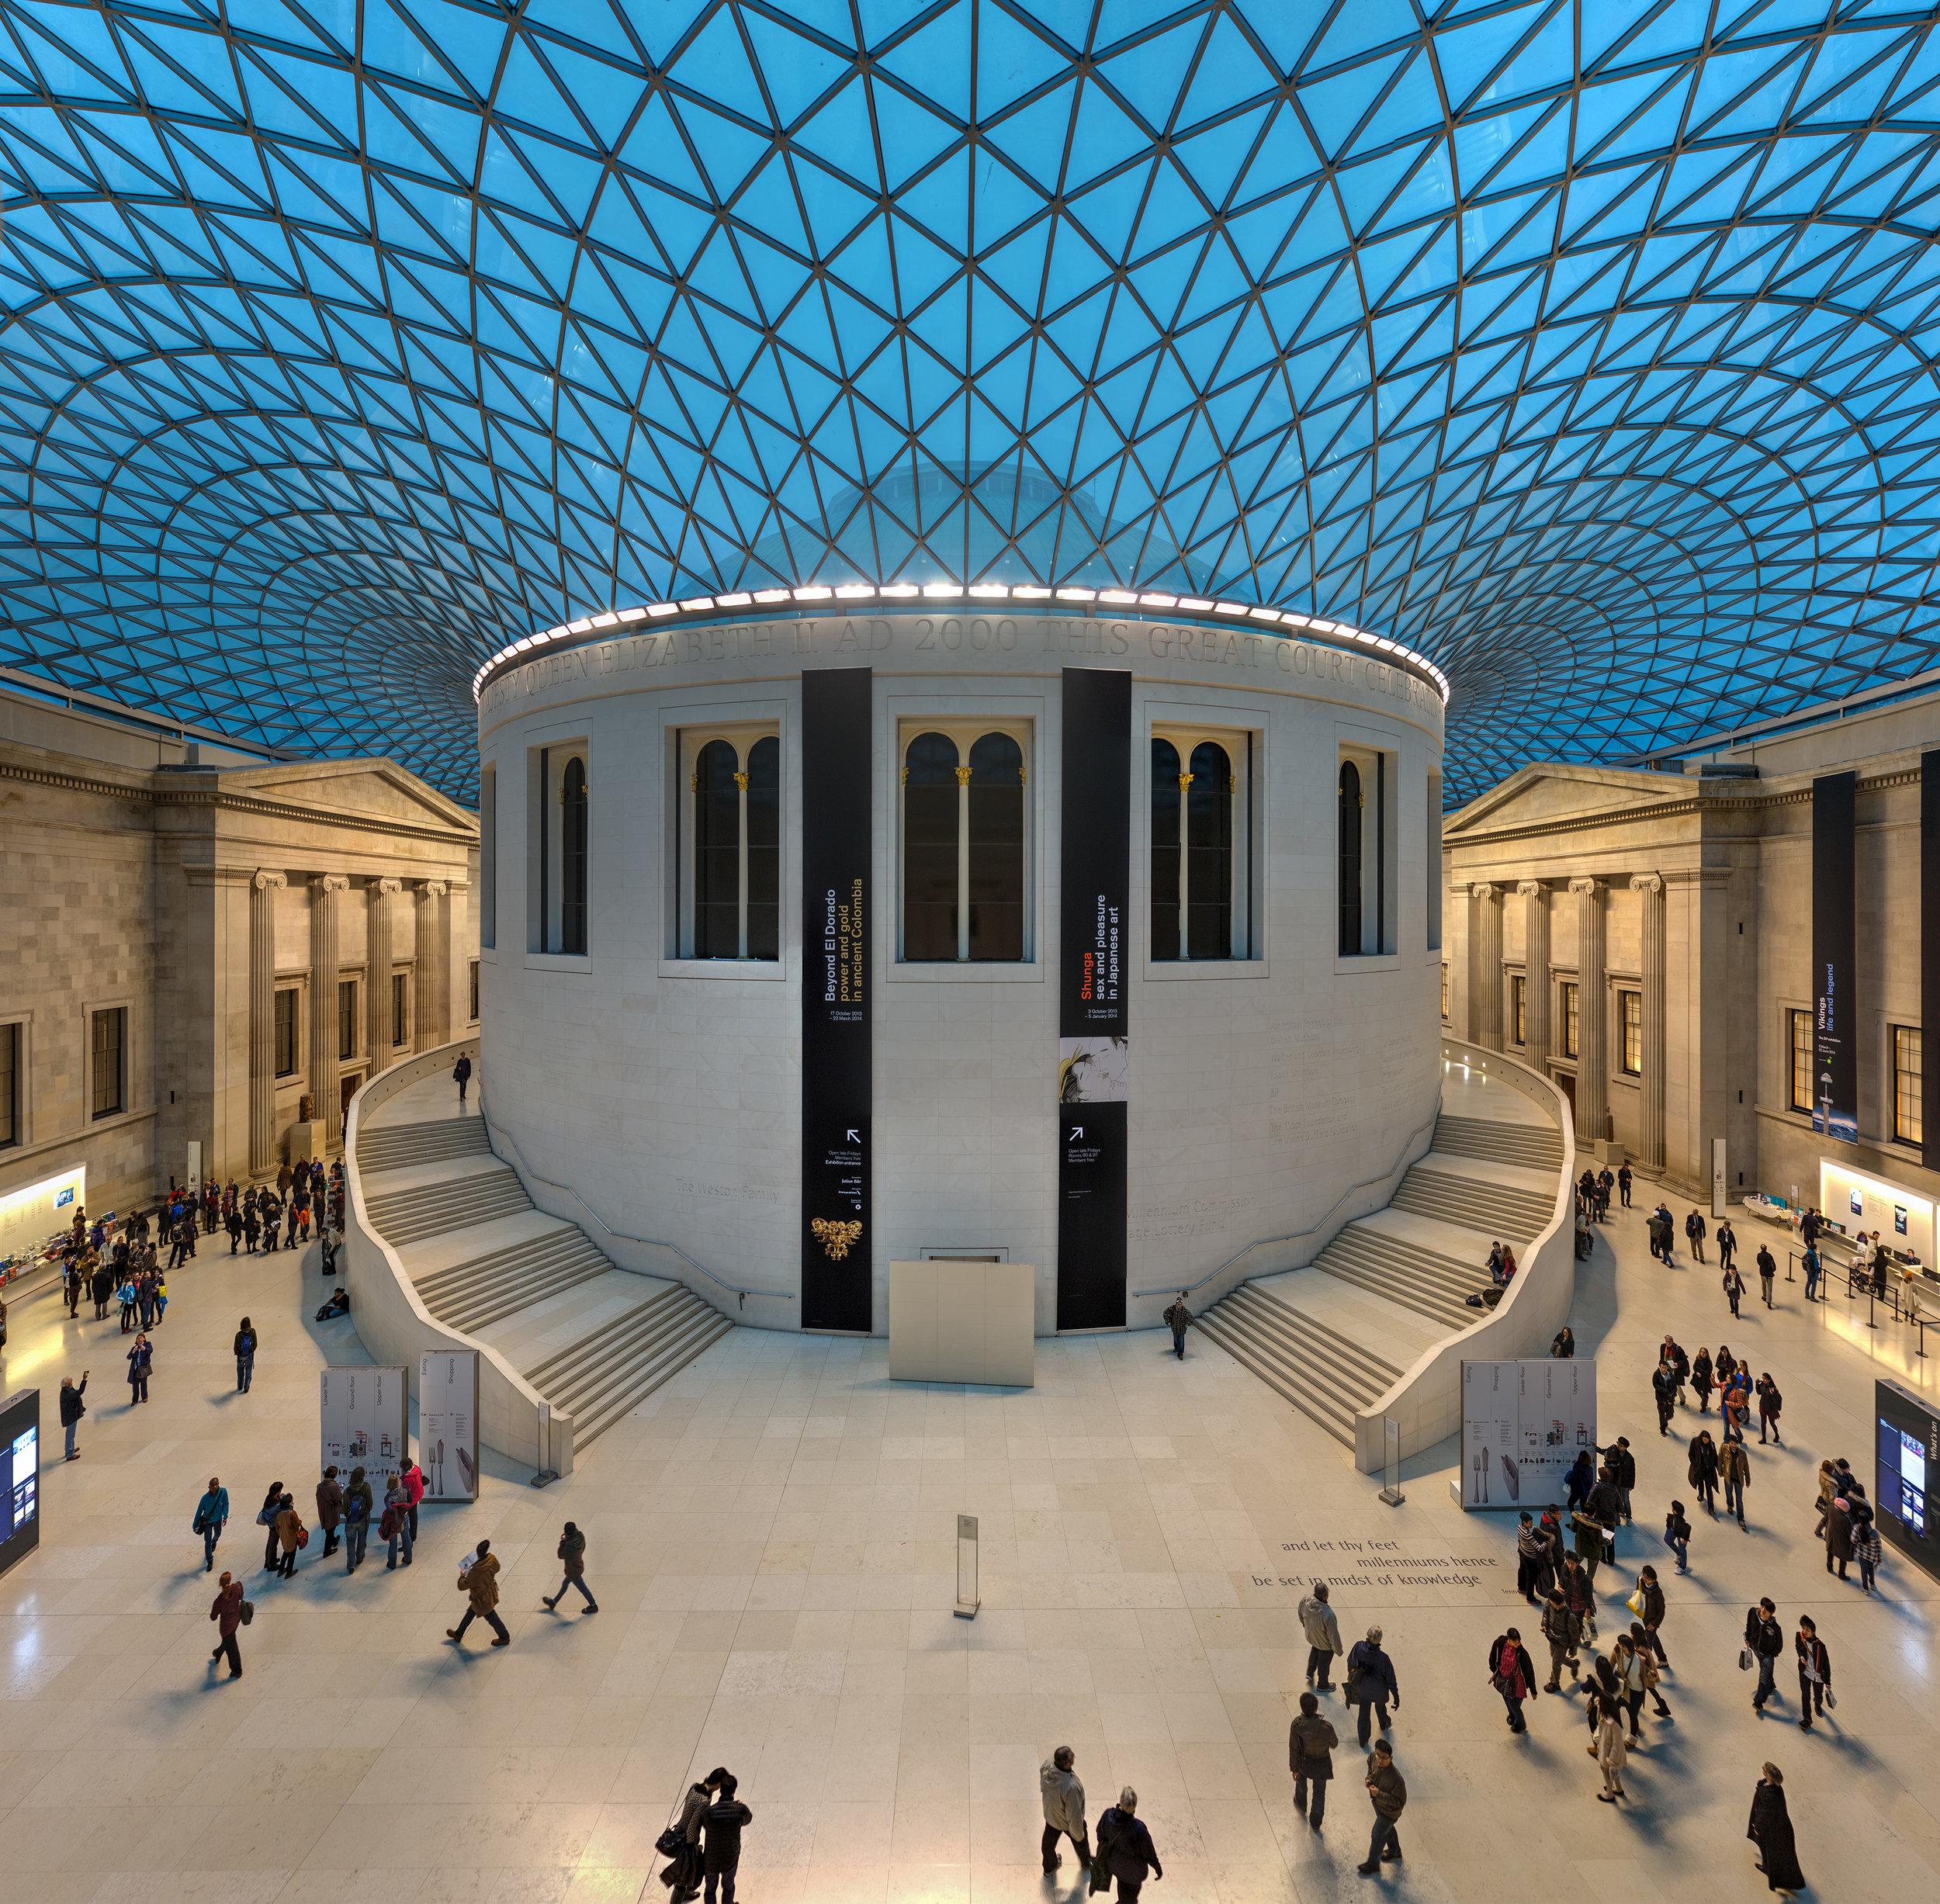 British_Museum_Great_Court,_London,_UK_-_Diliff.jpg